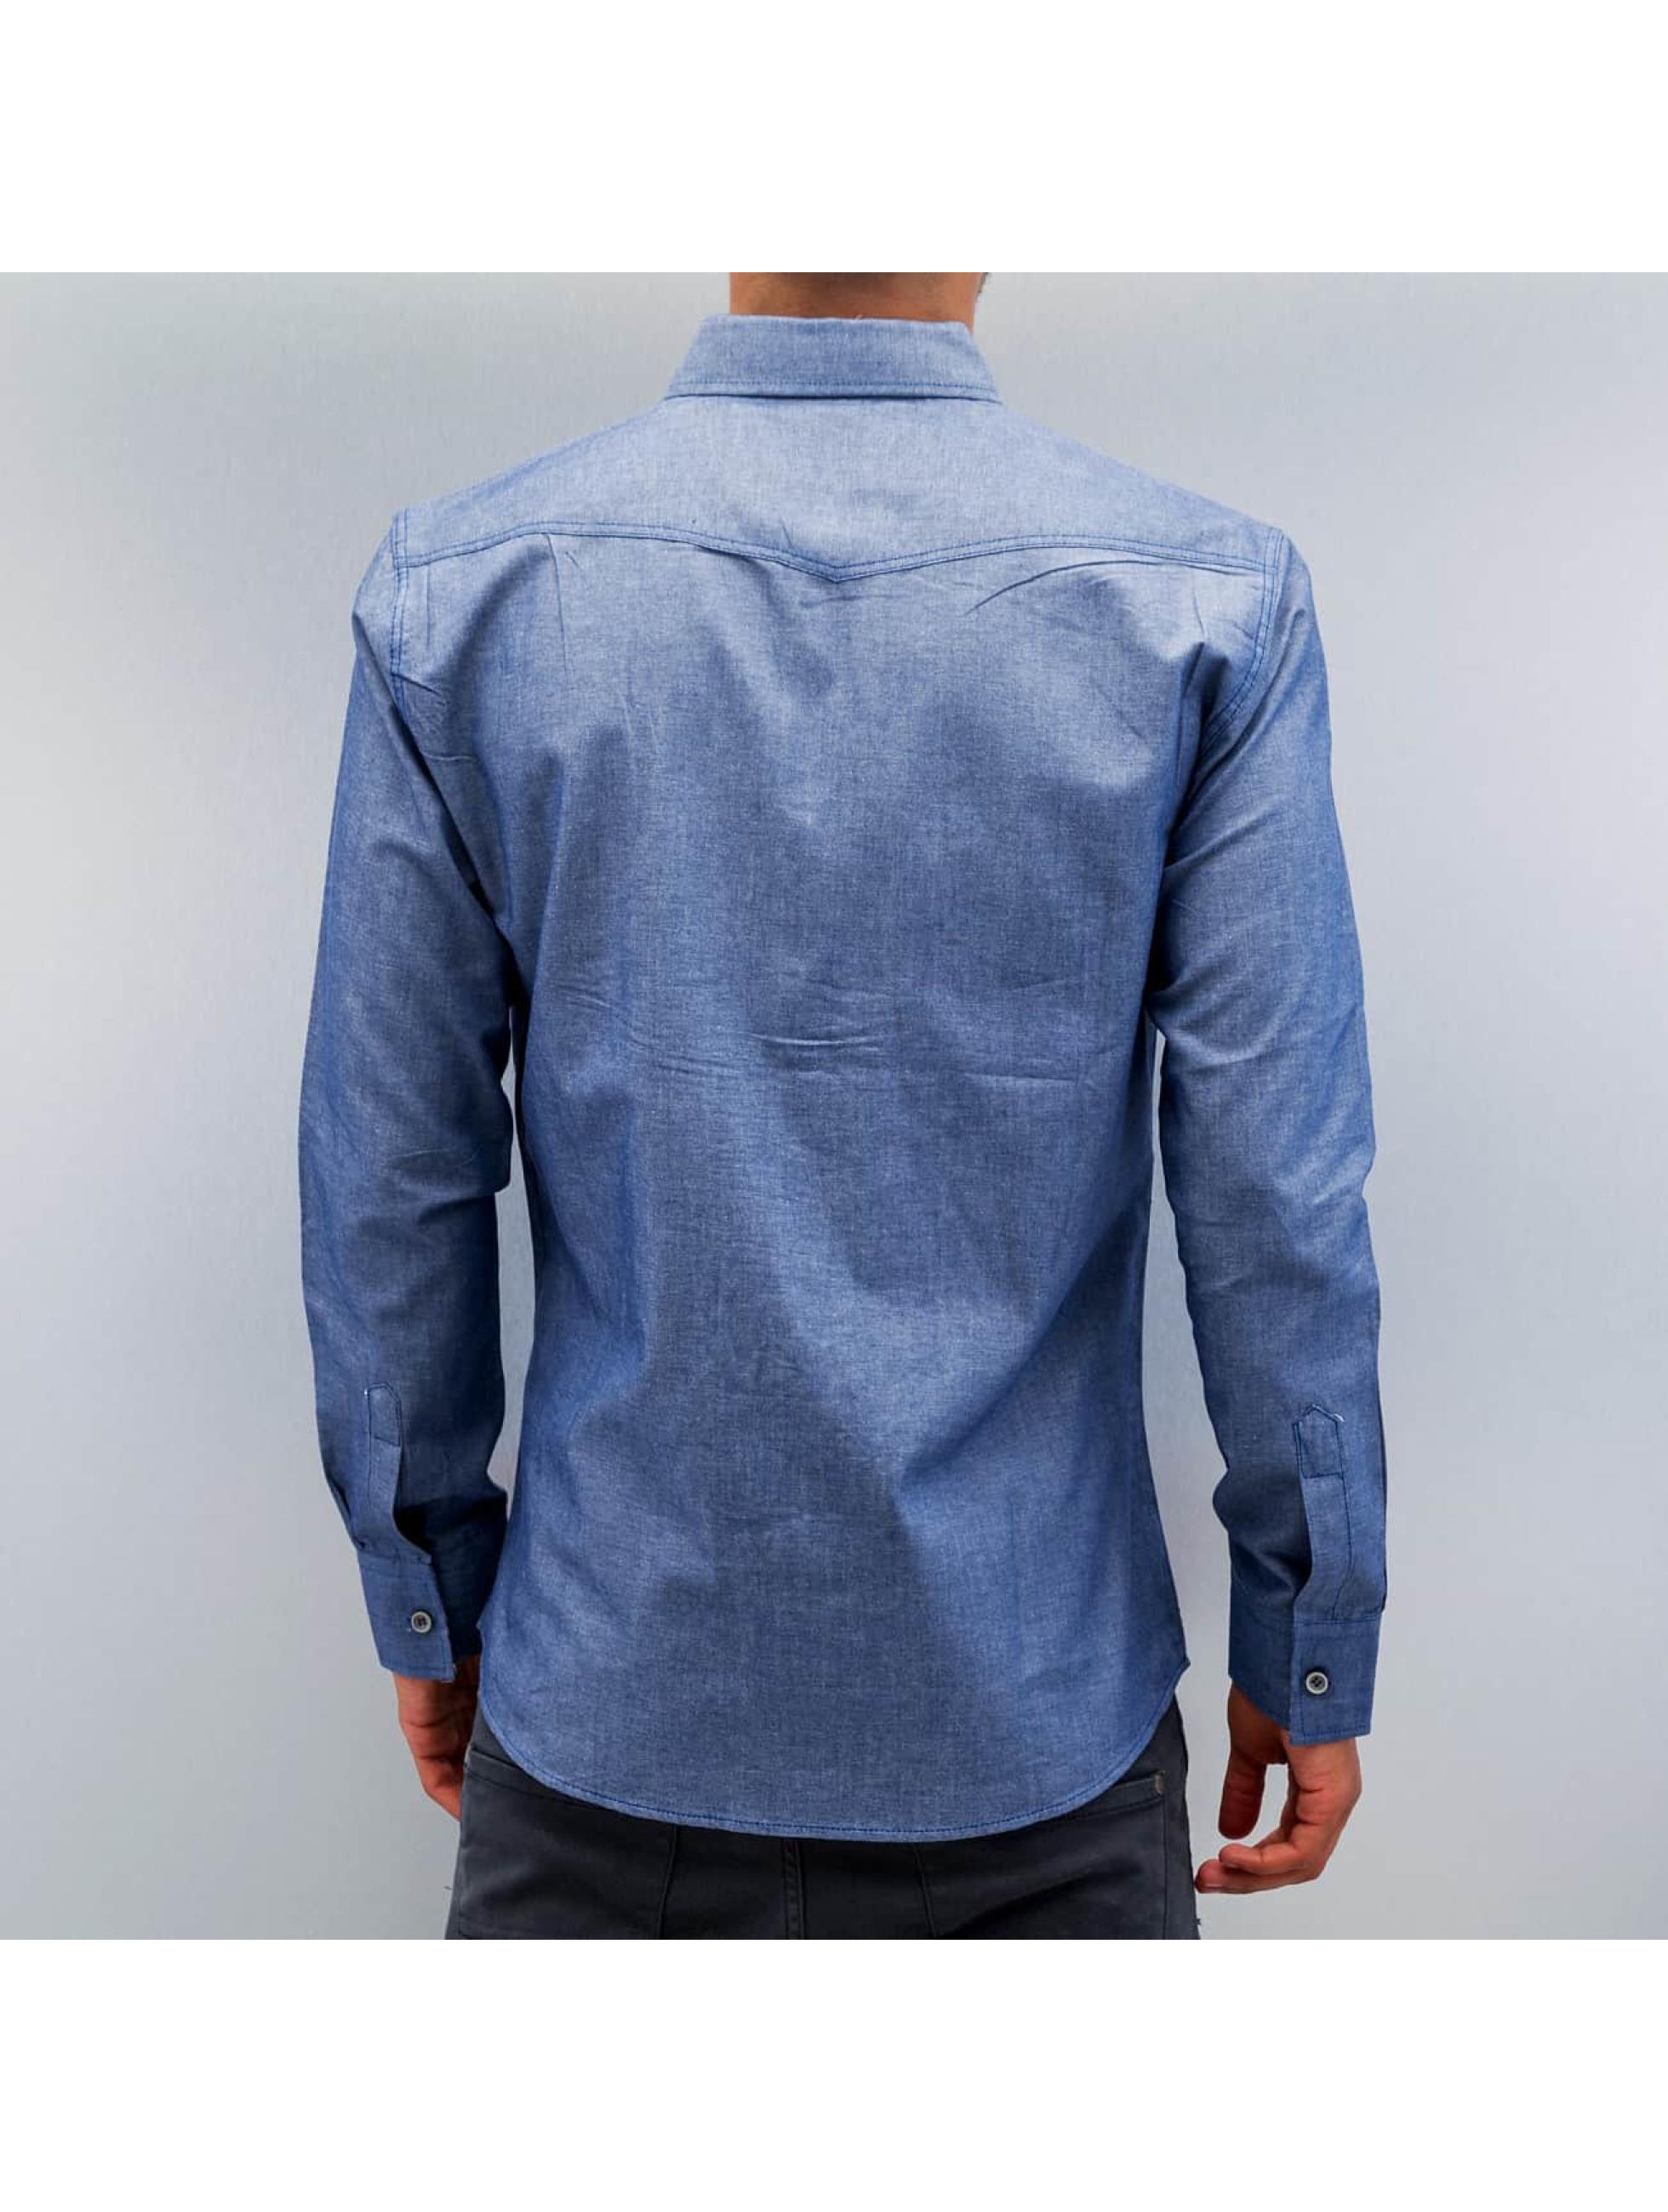 Open overhemd Breast Pocket blauw